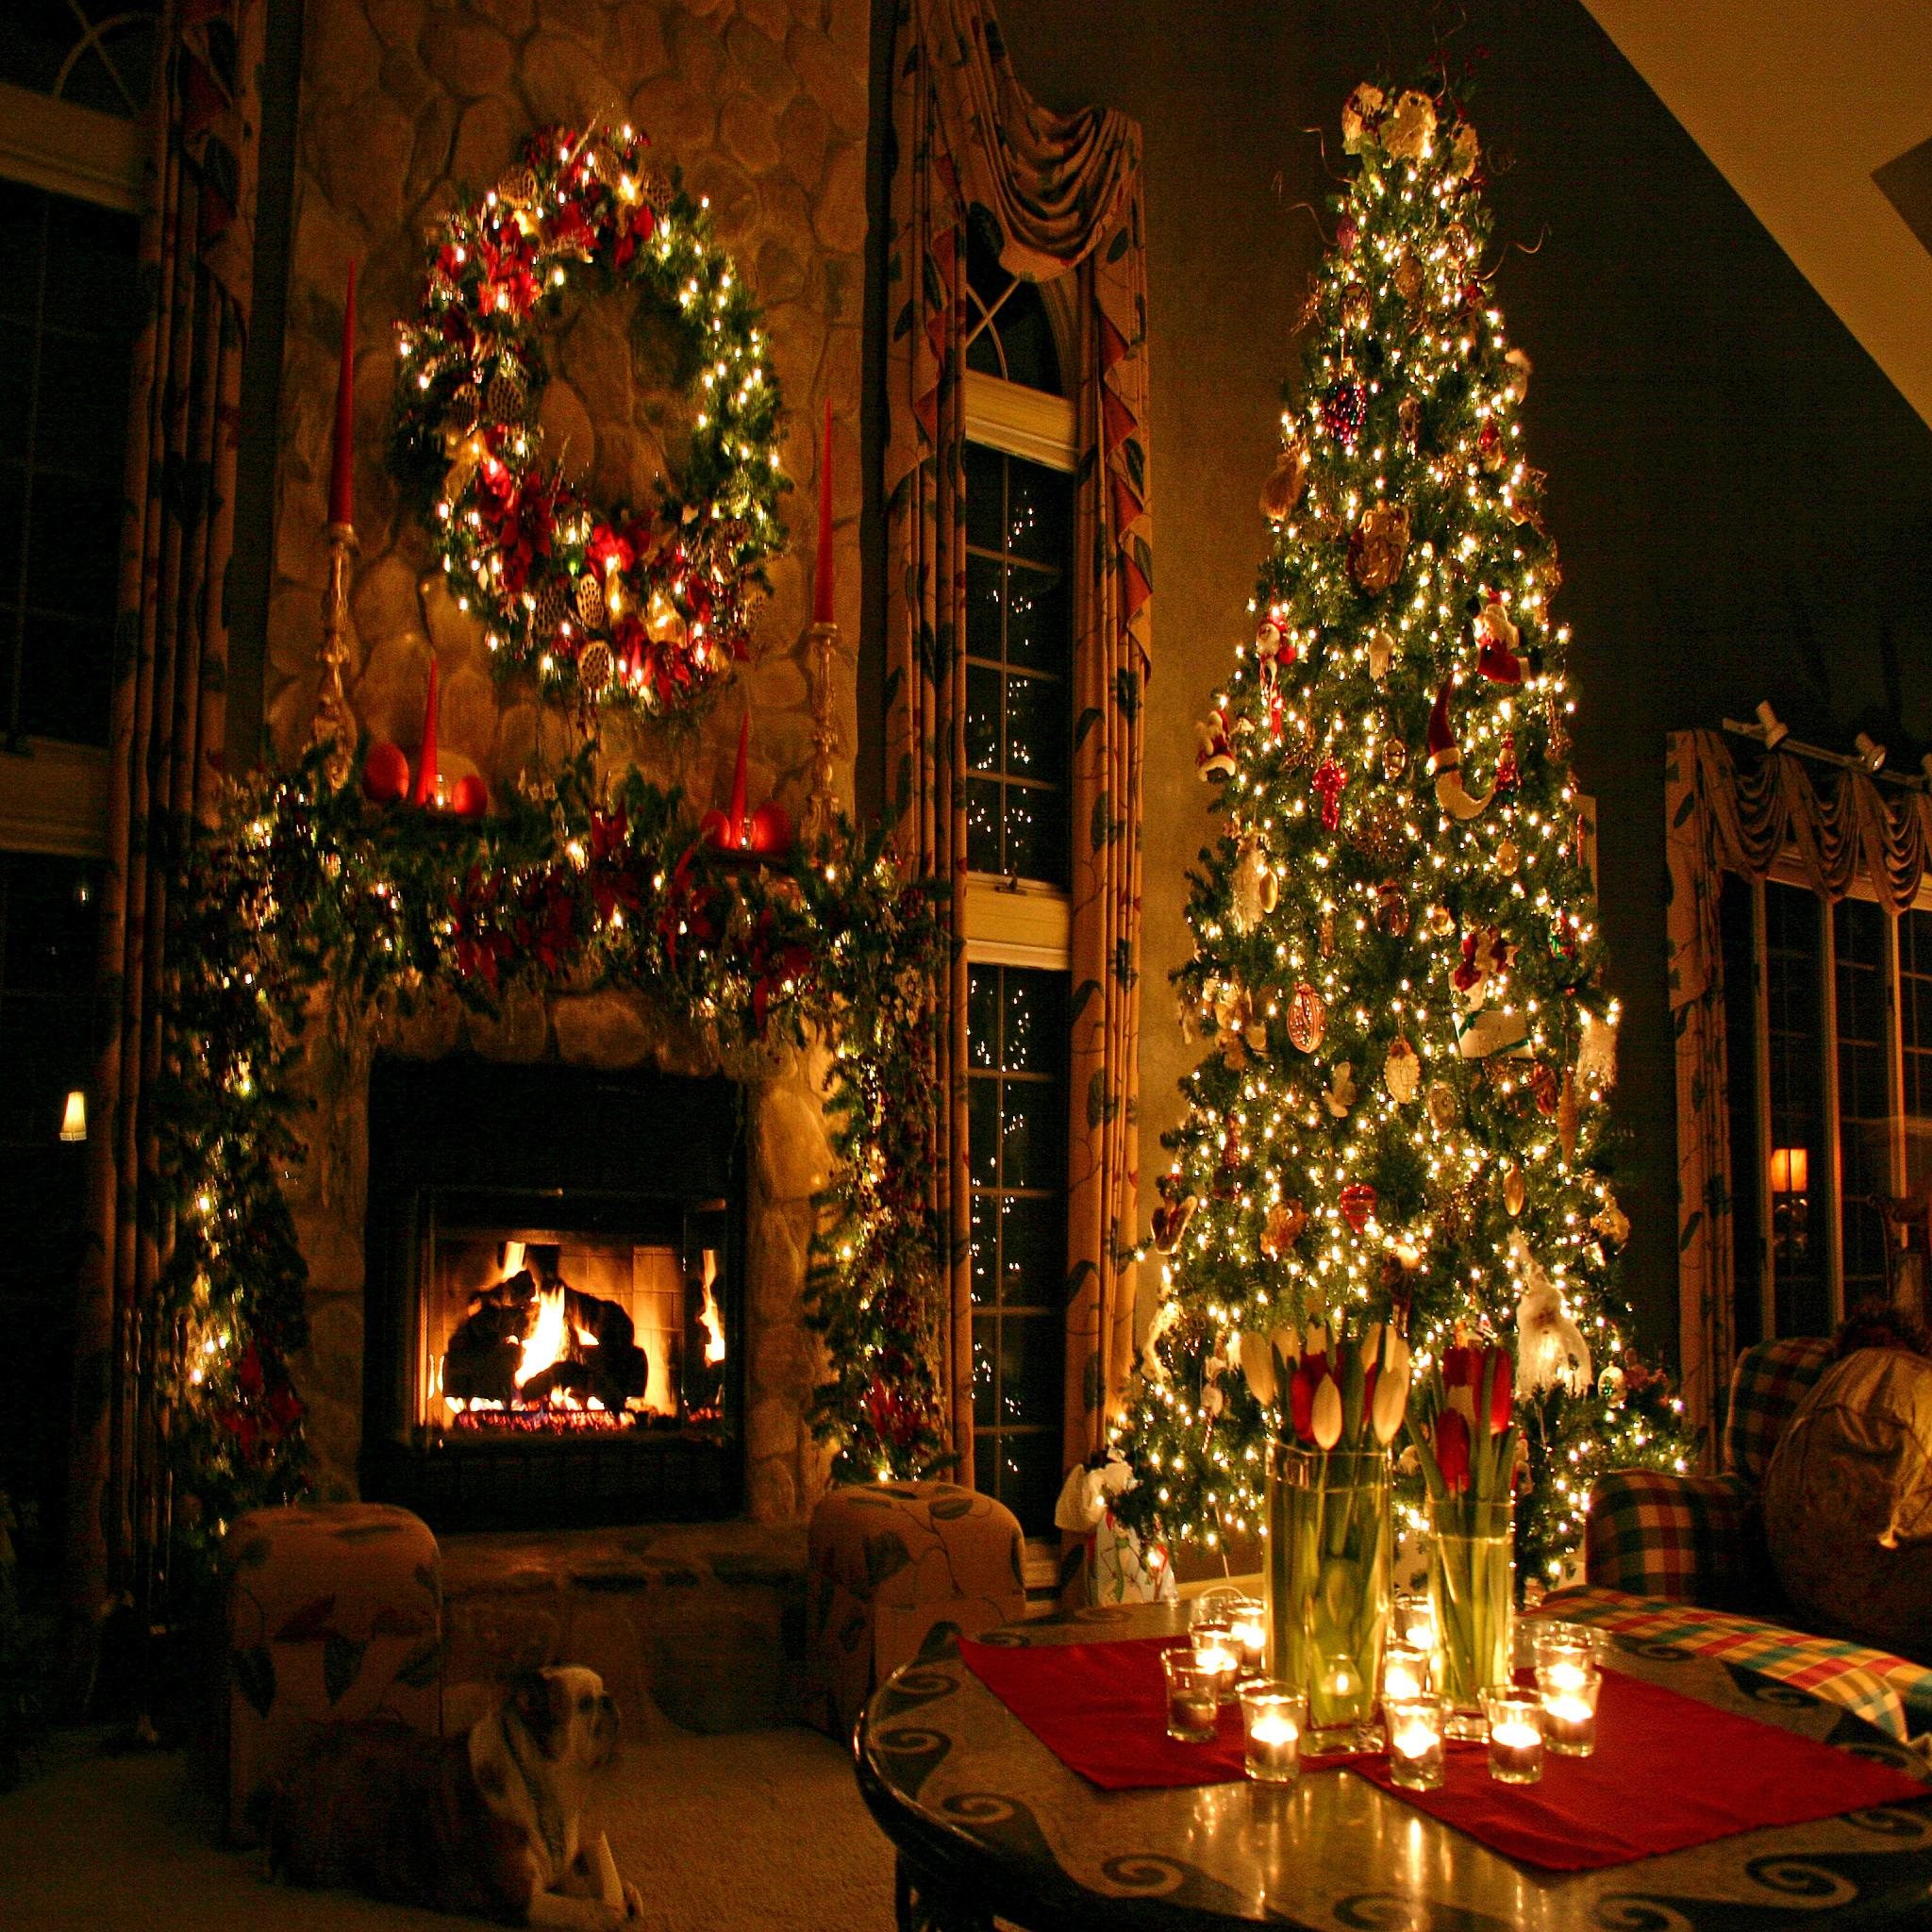 Christmas Season Wallpaper